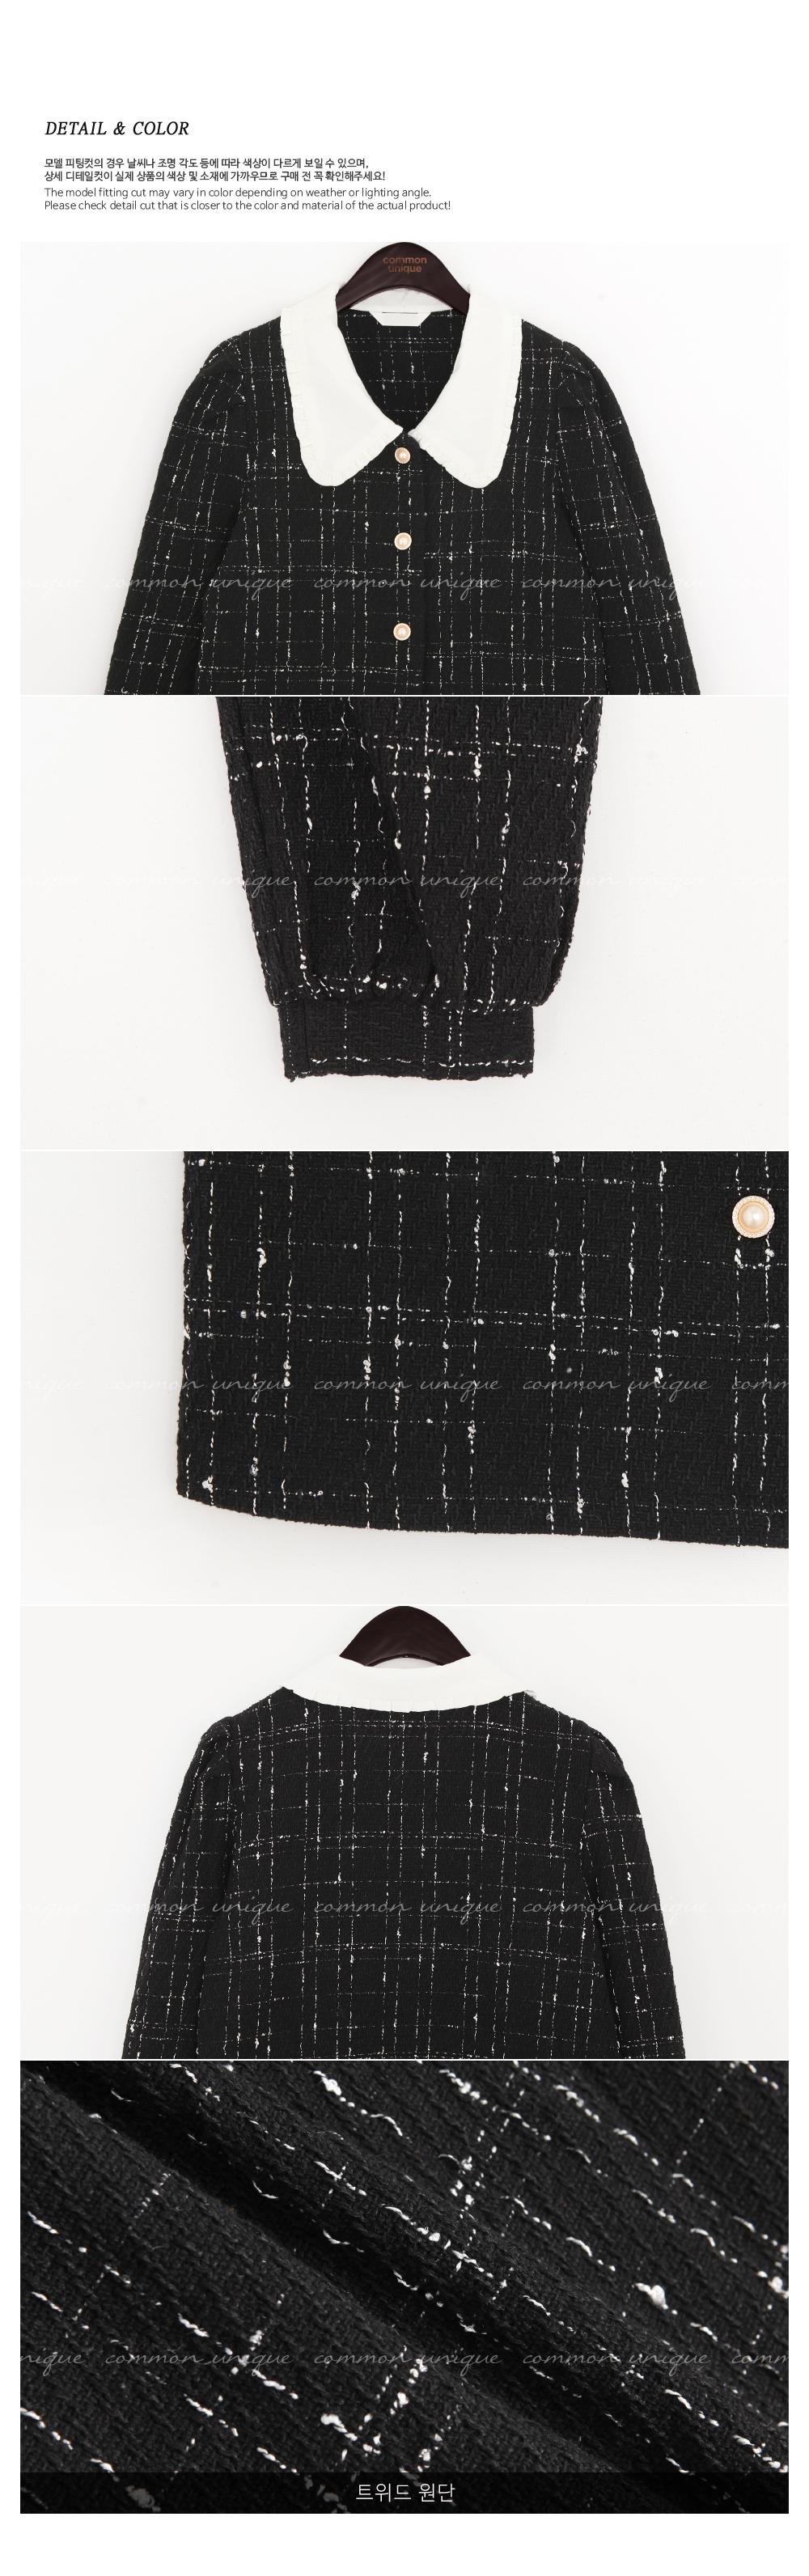 jacket charcoal color image-S1L4